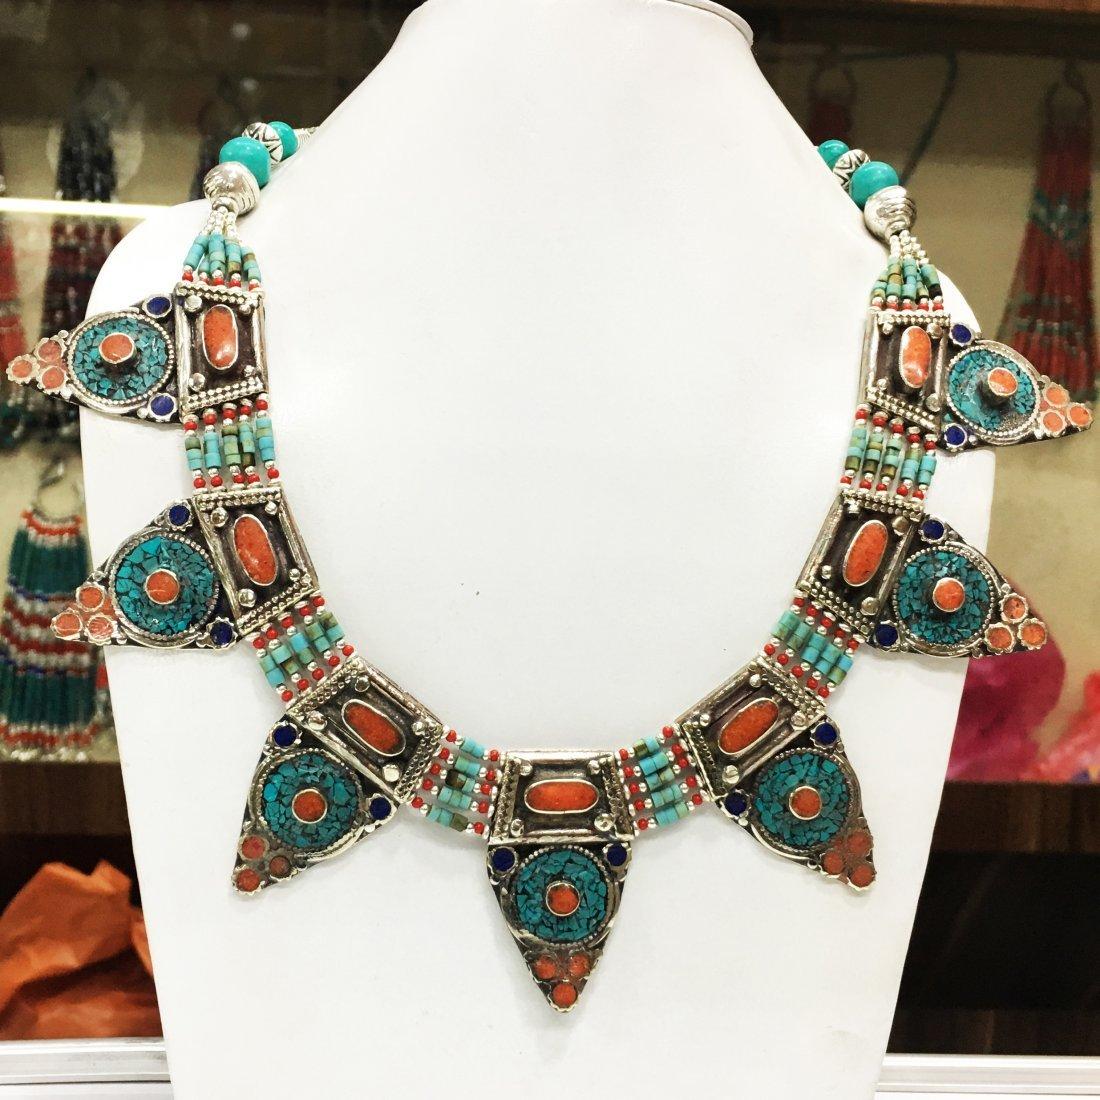 Vintage Turquoise Tibetan Asian Necklace